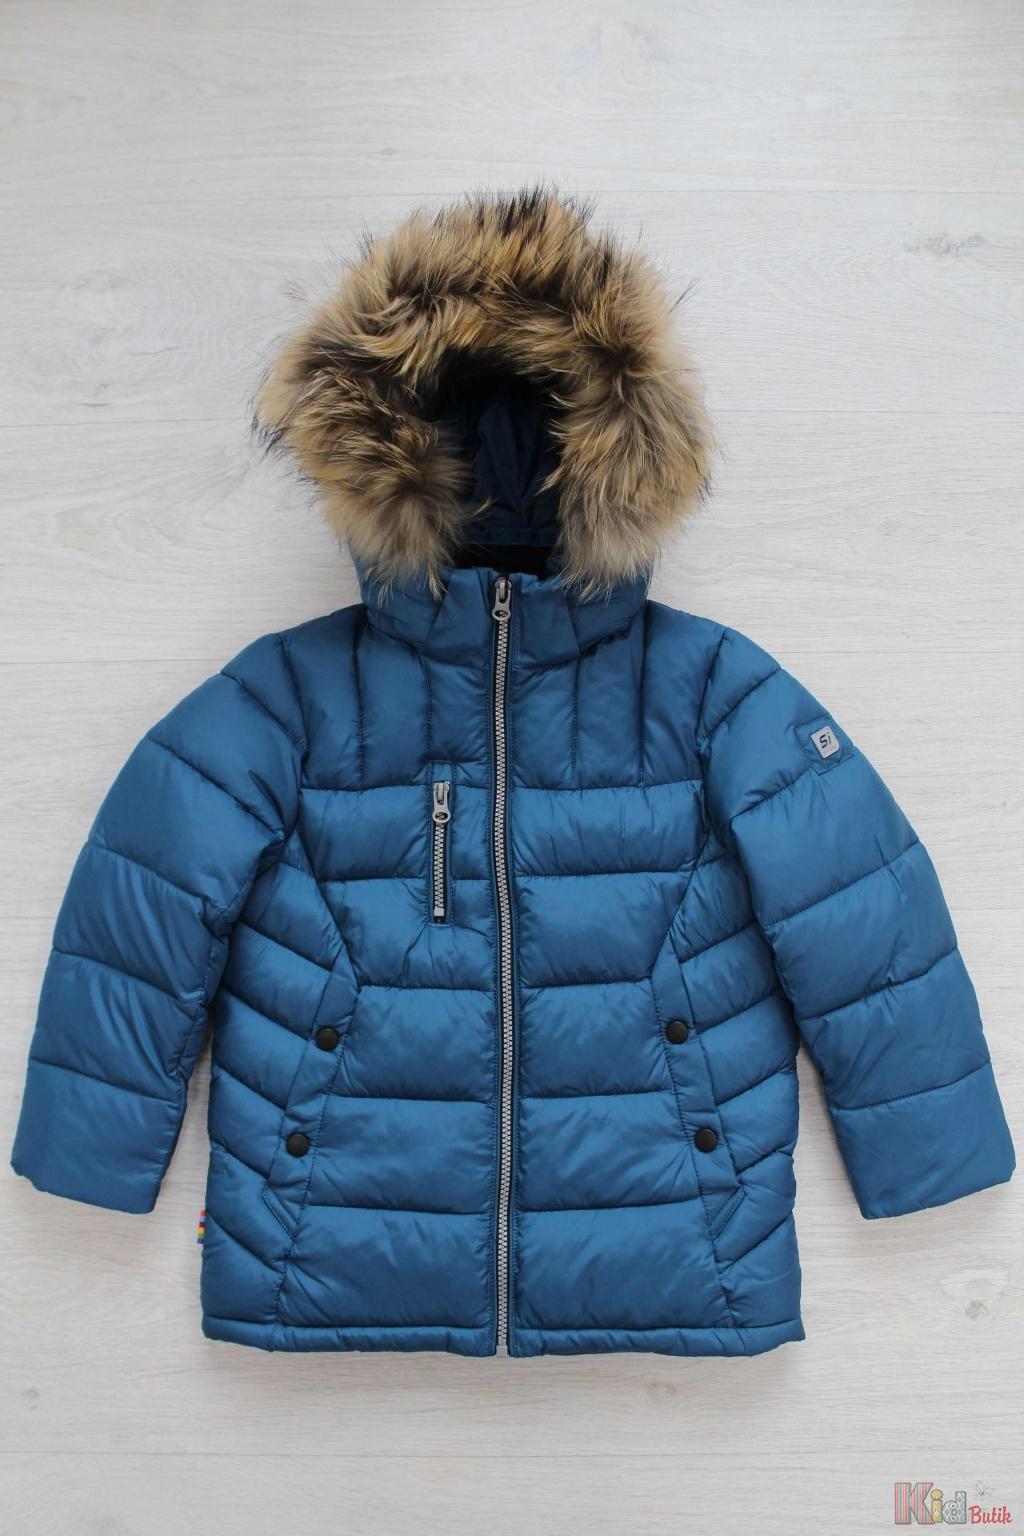 ᐈ Куртка зимова для хлопчика Snowimage 6901250493182 купити в ... 33512d5a325e4